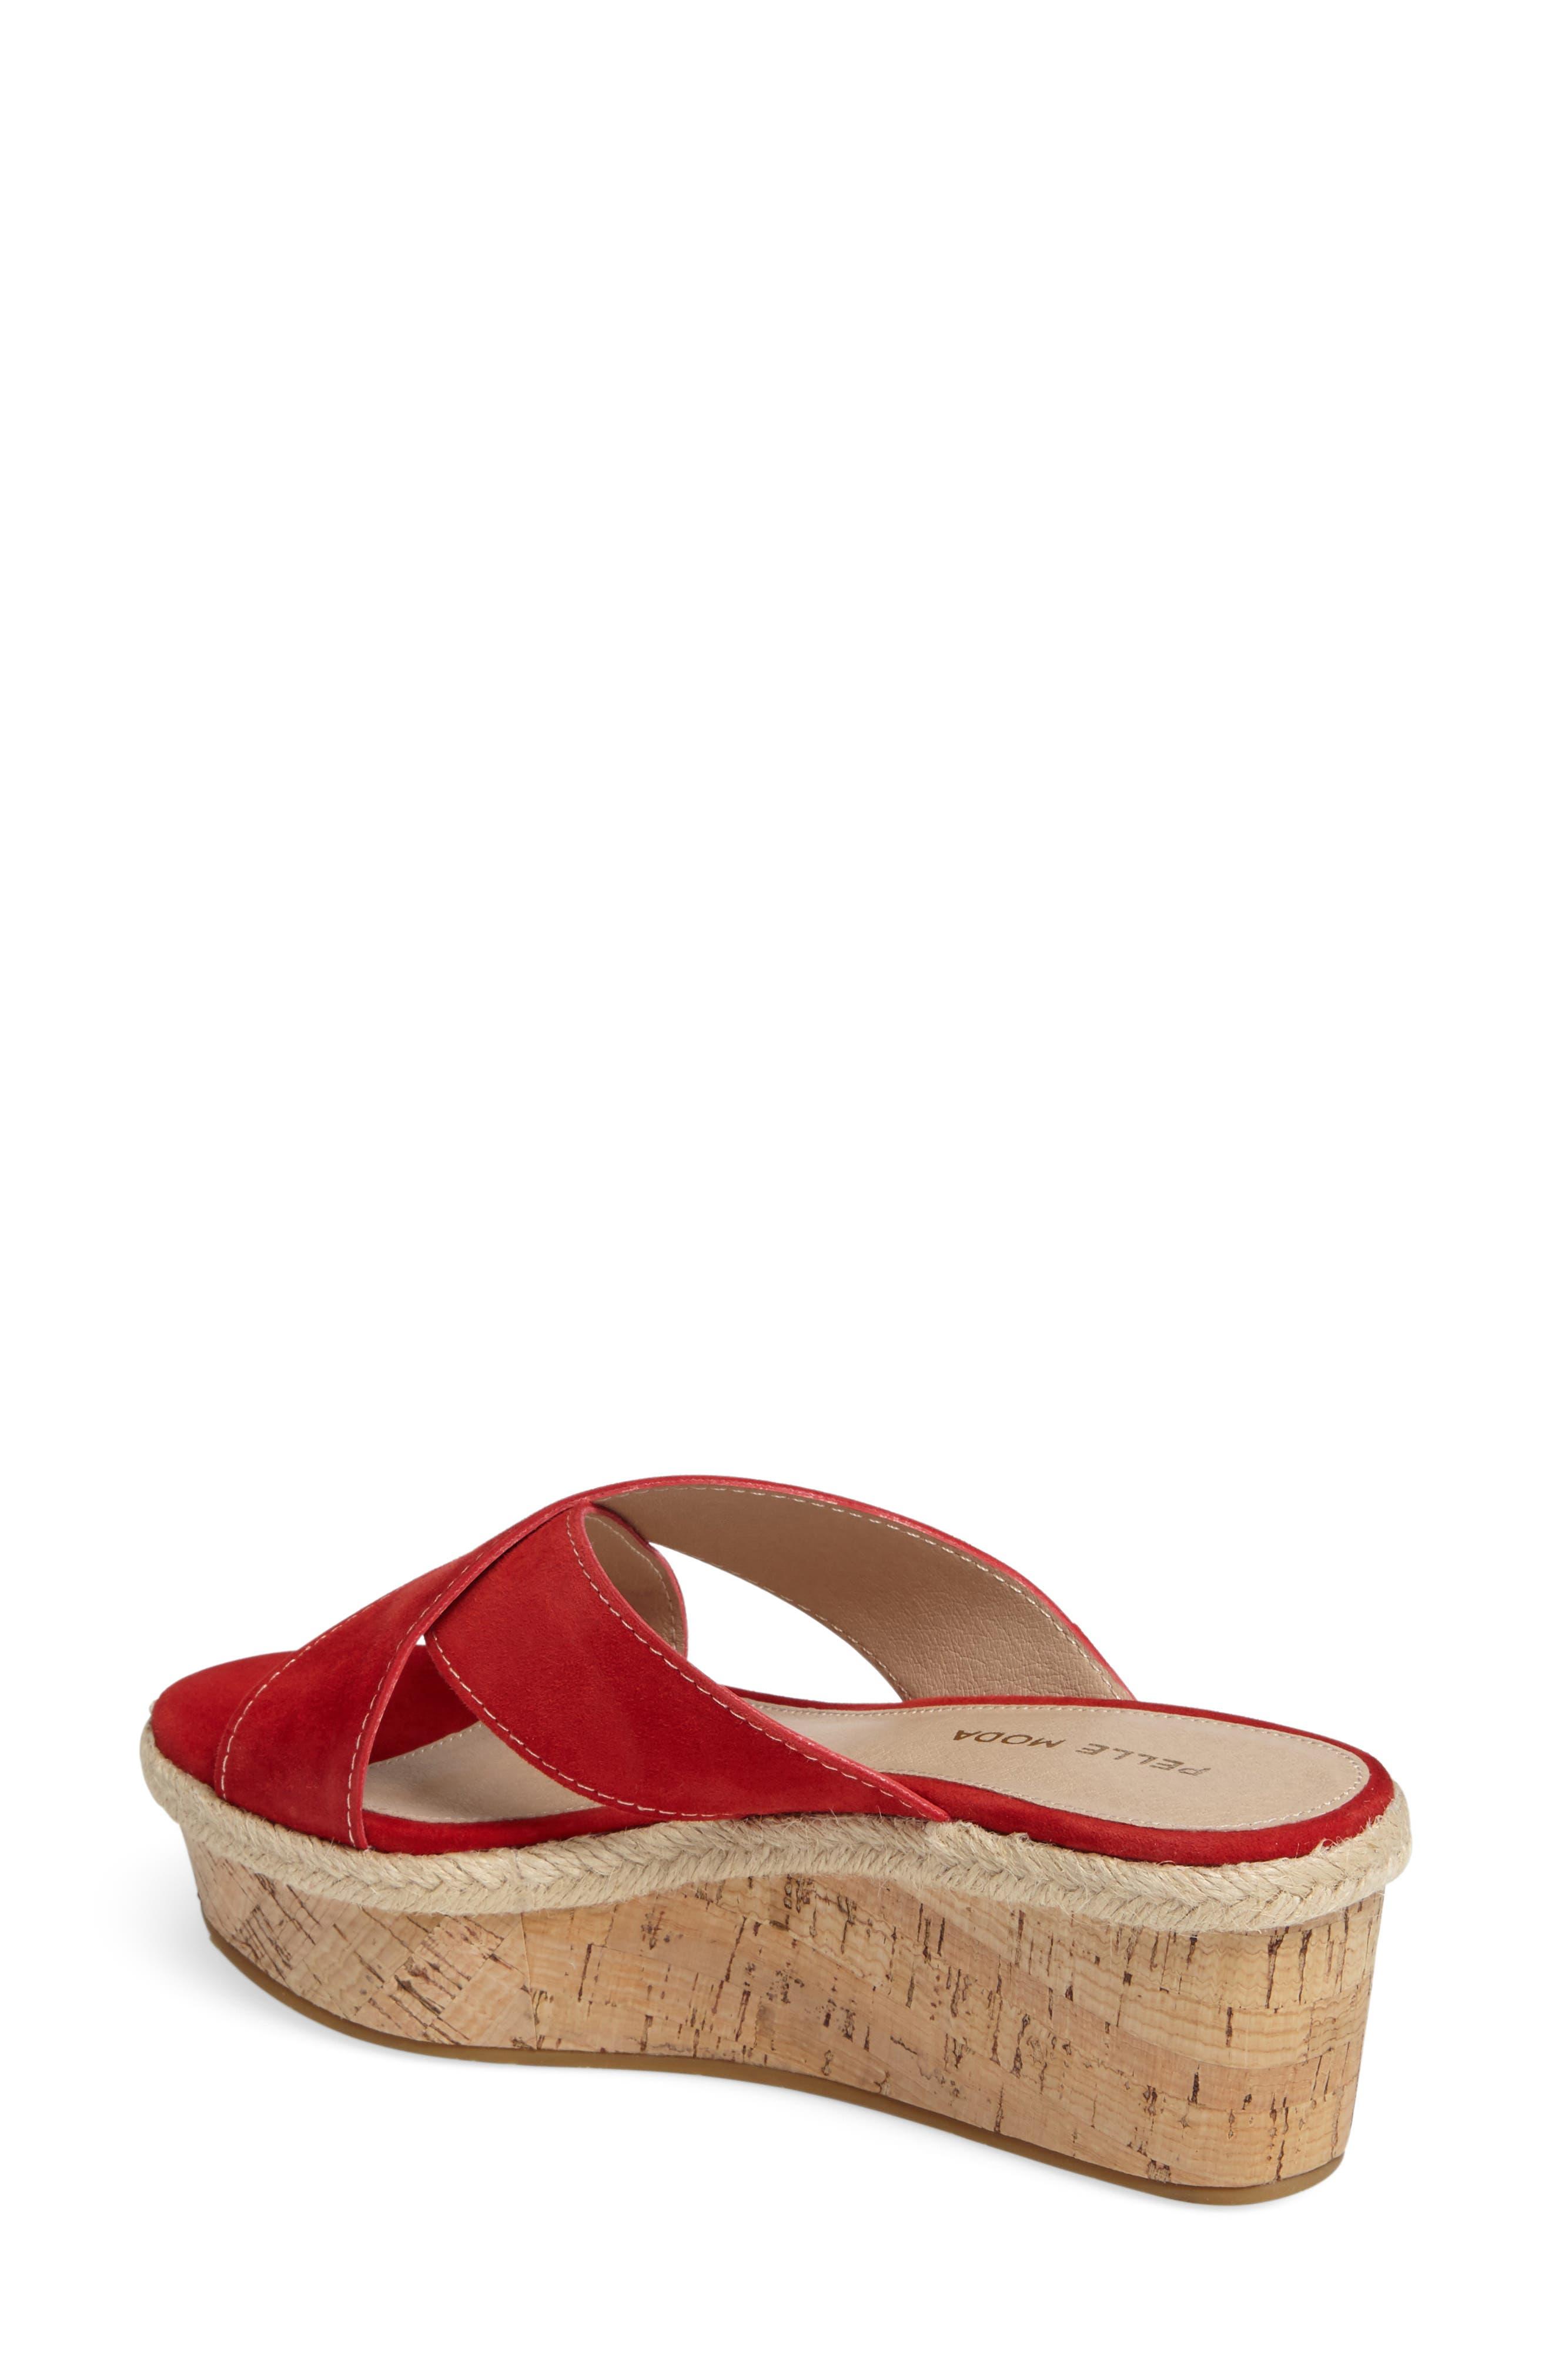 Harriet Platform Wedge Sandal,                             Alternate thumbnail 4, color,